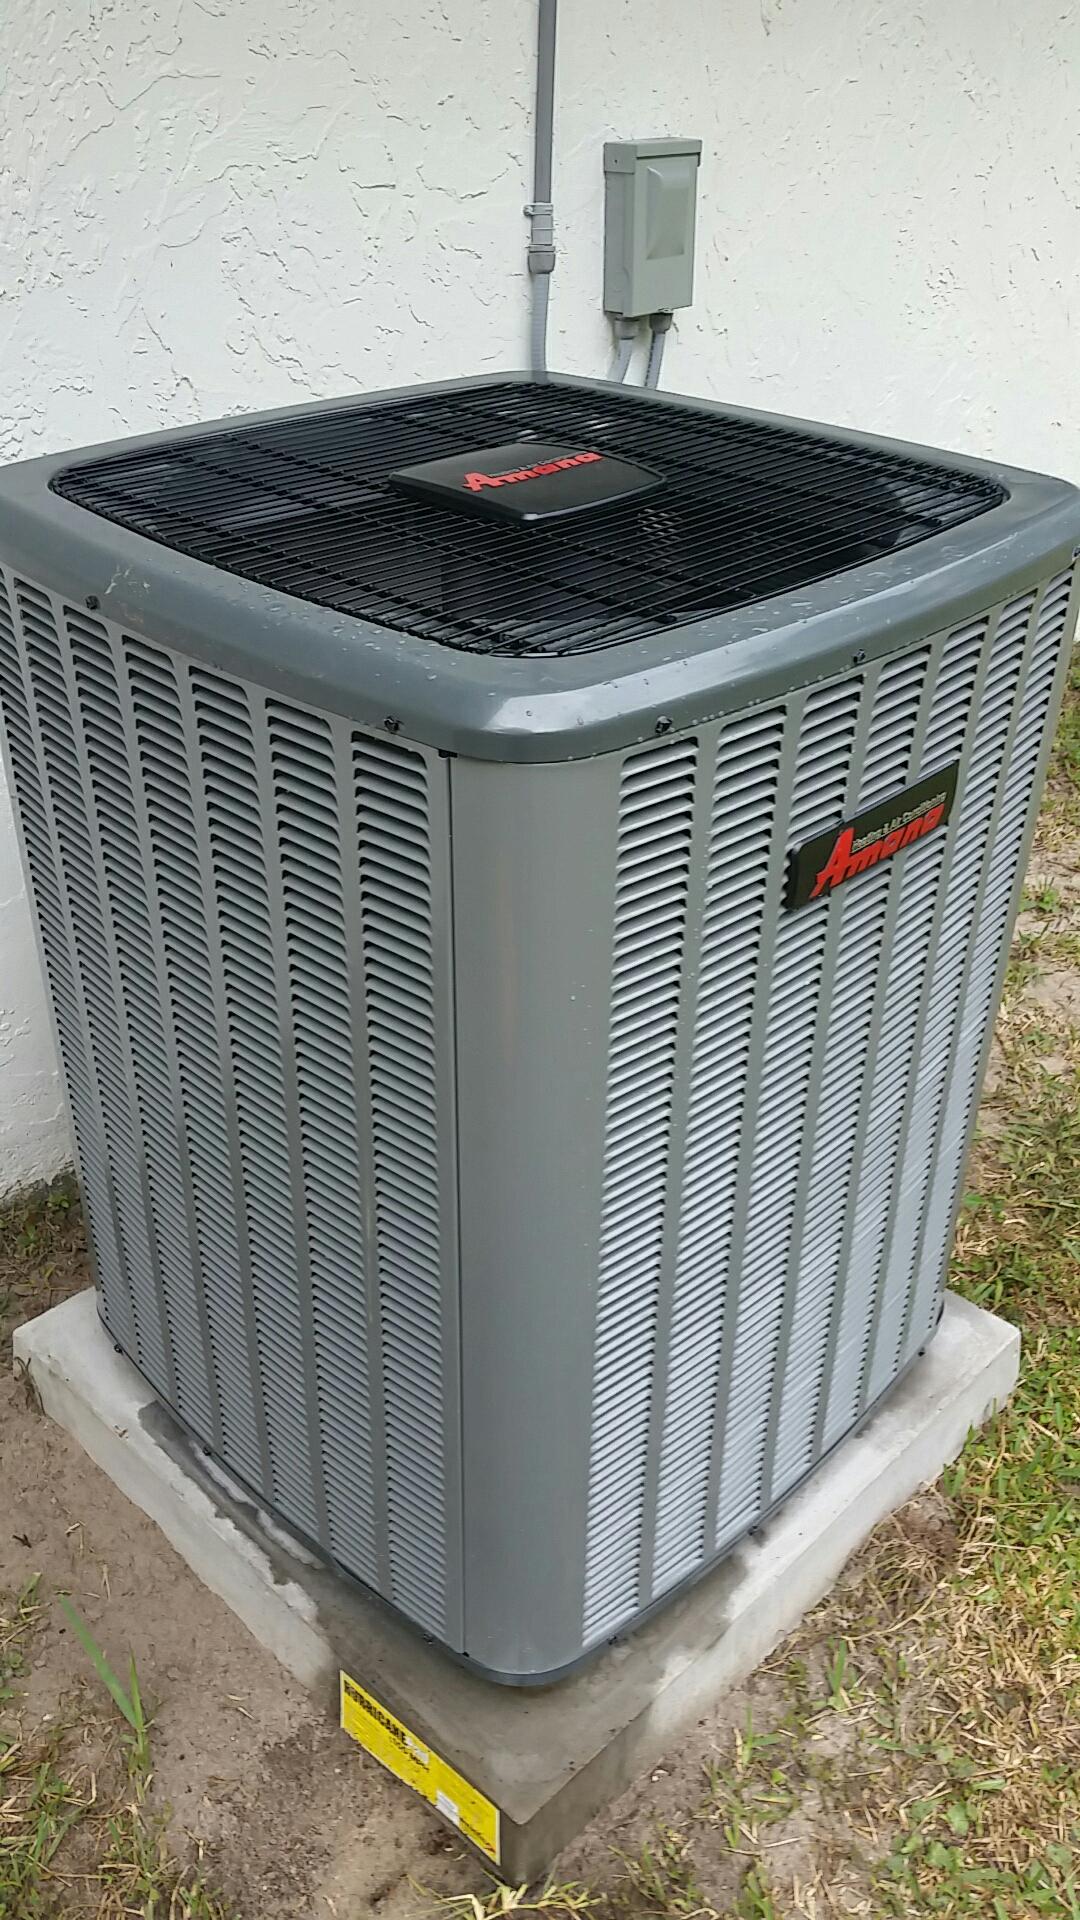 San Mateo, FL - Service on amana heat pump